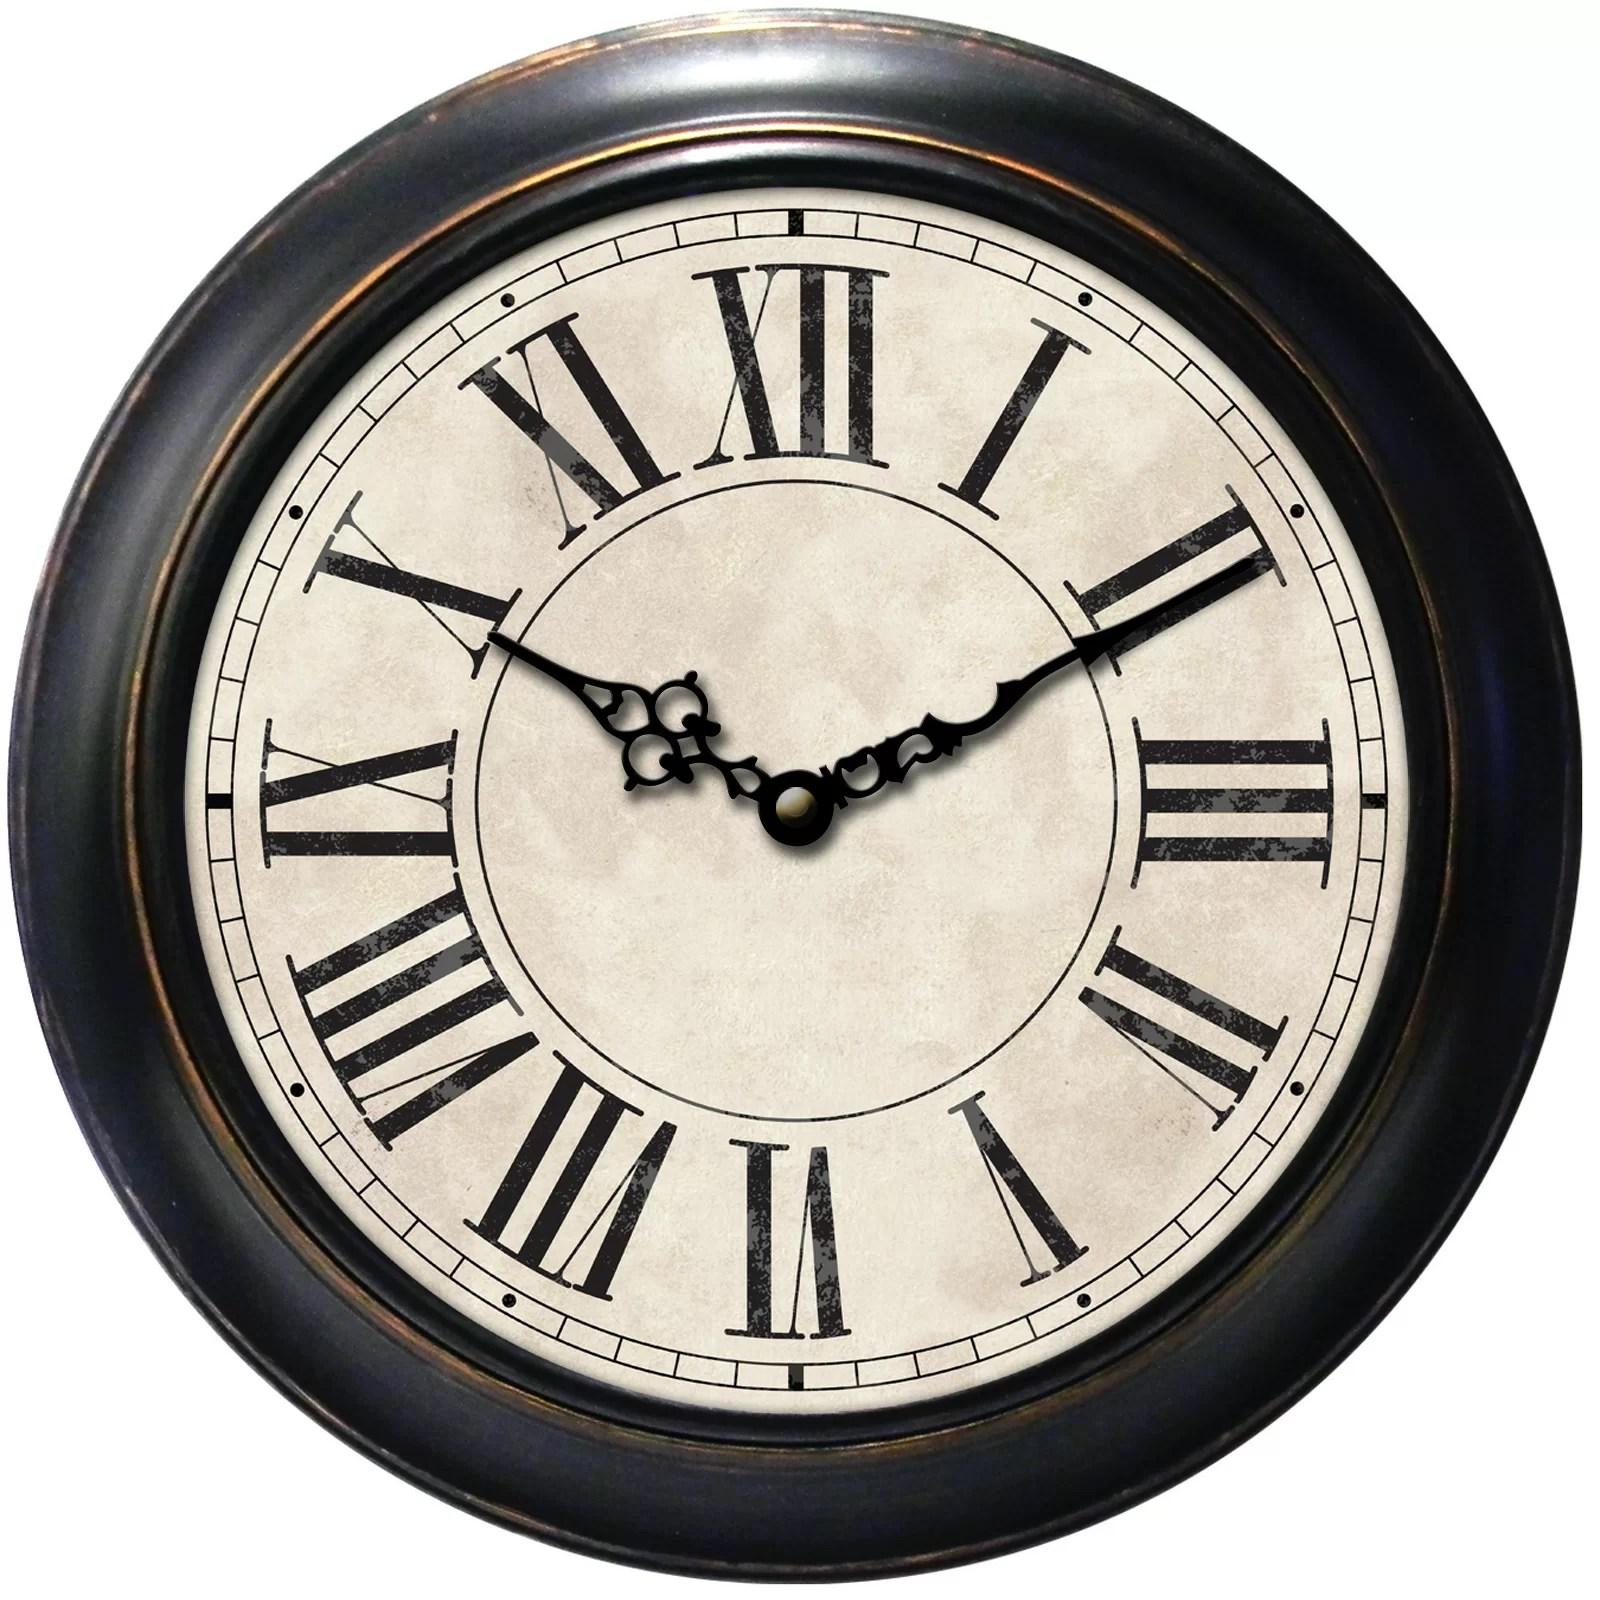 Three Posts Decorative Home 18 Classic Roman Numeral Wall Clock Amp Reviews